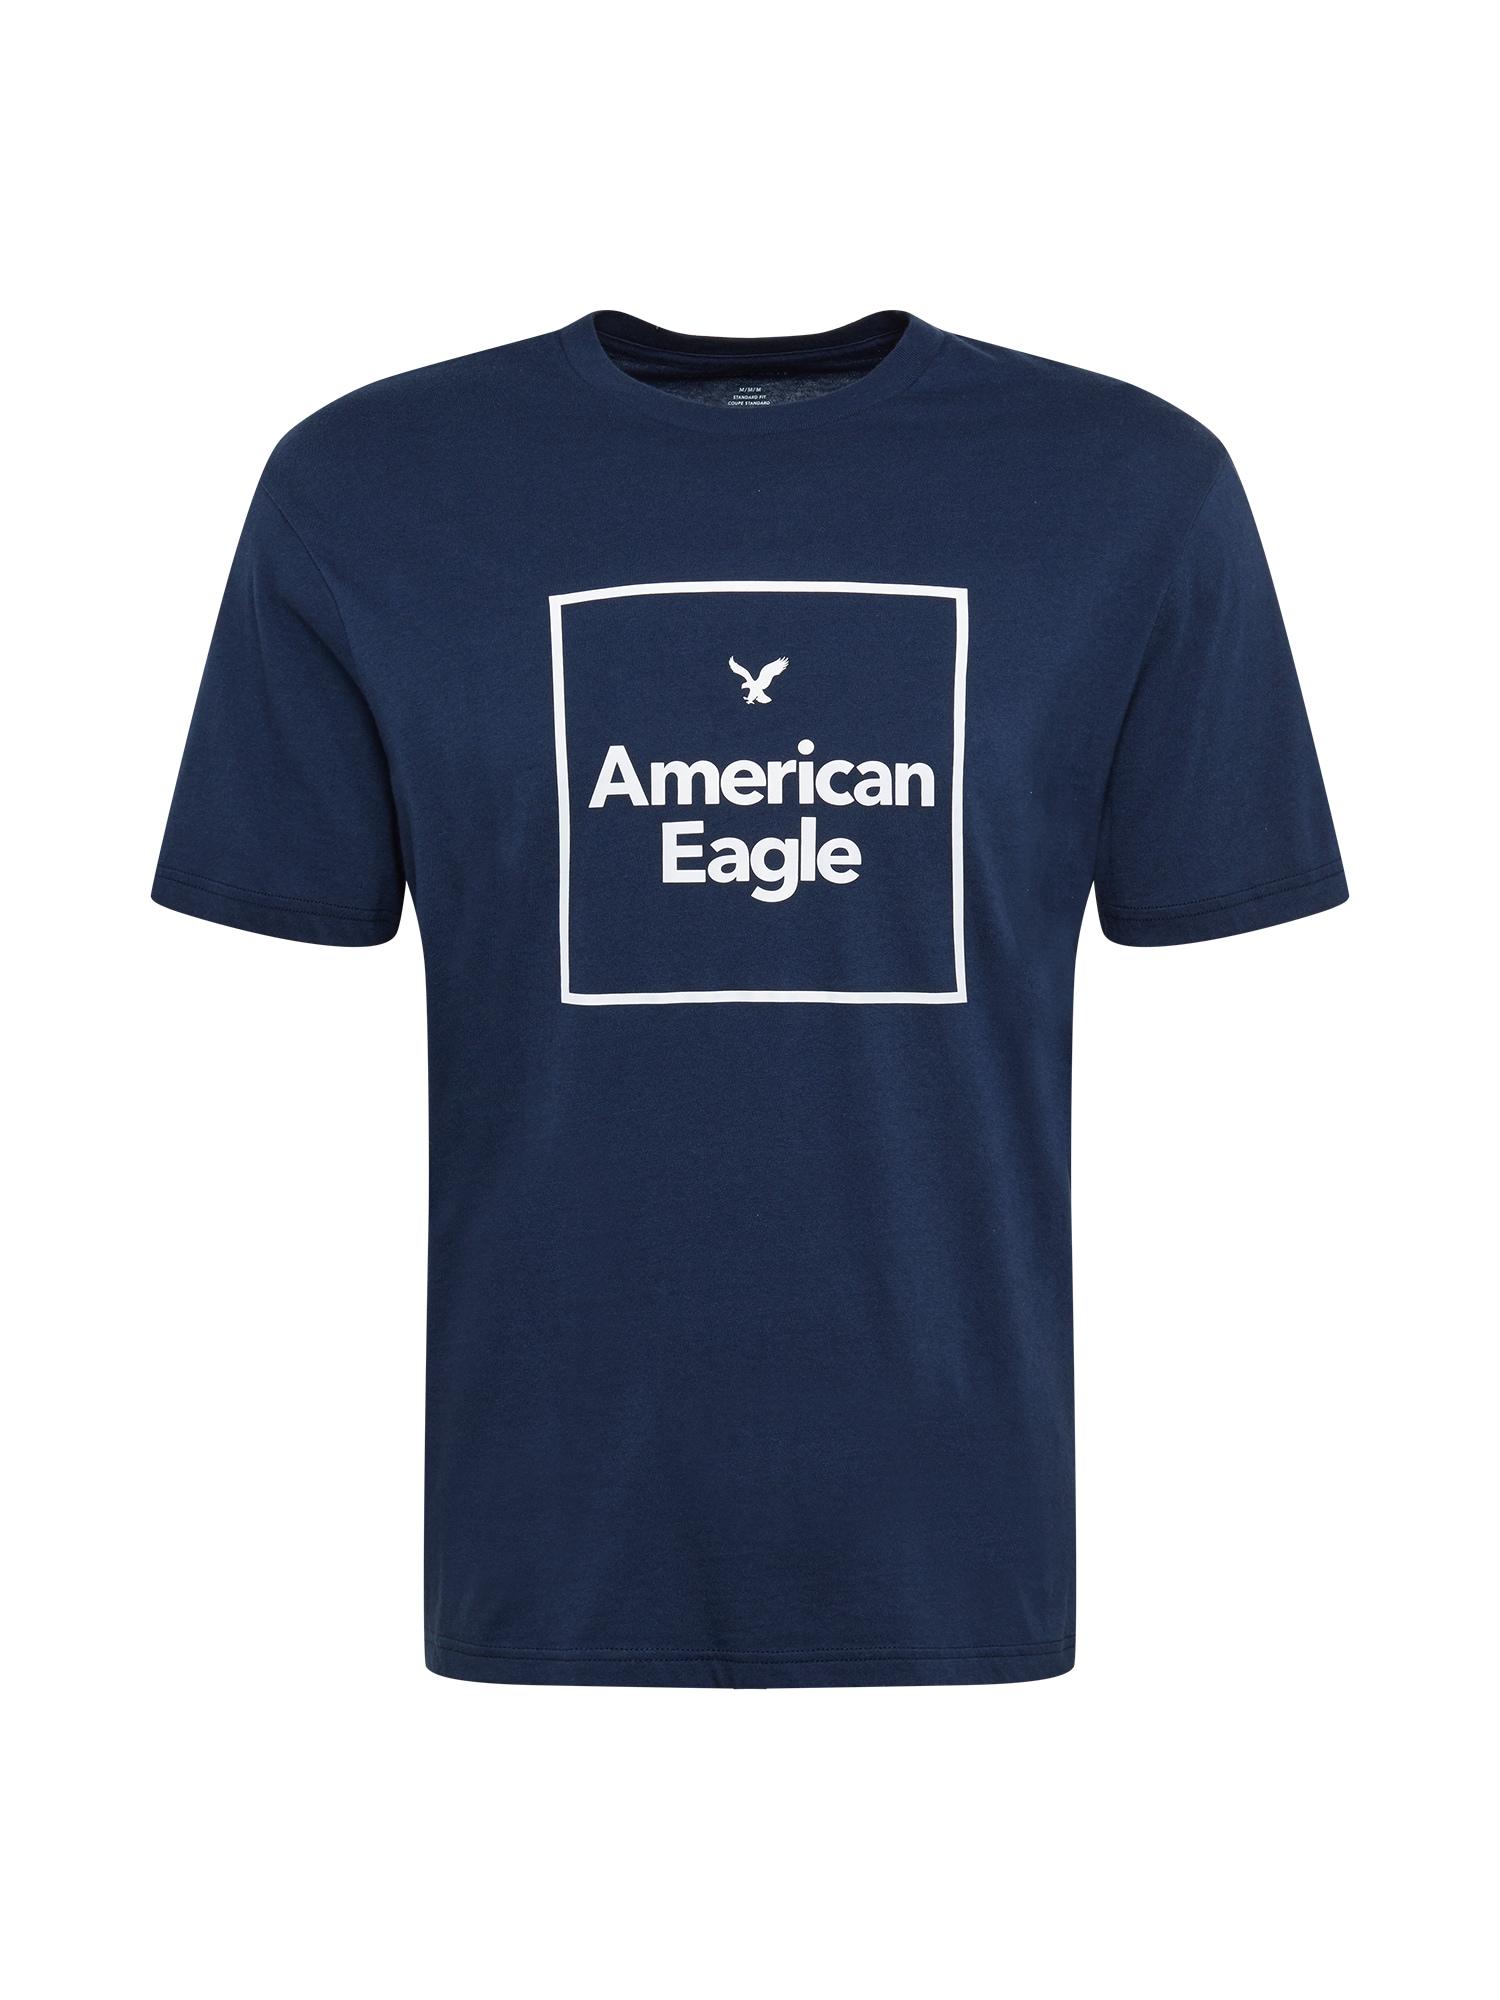 American Eagle Tričko  námořnická modř / bílá